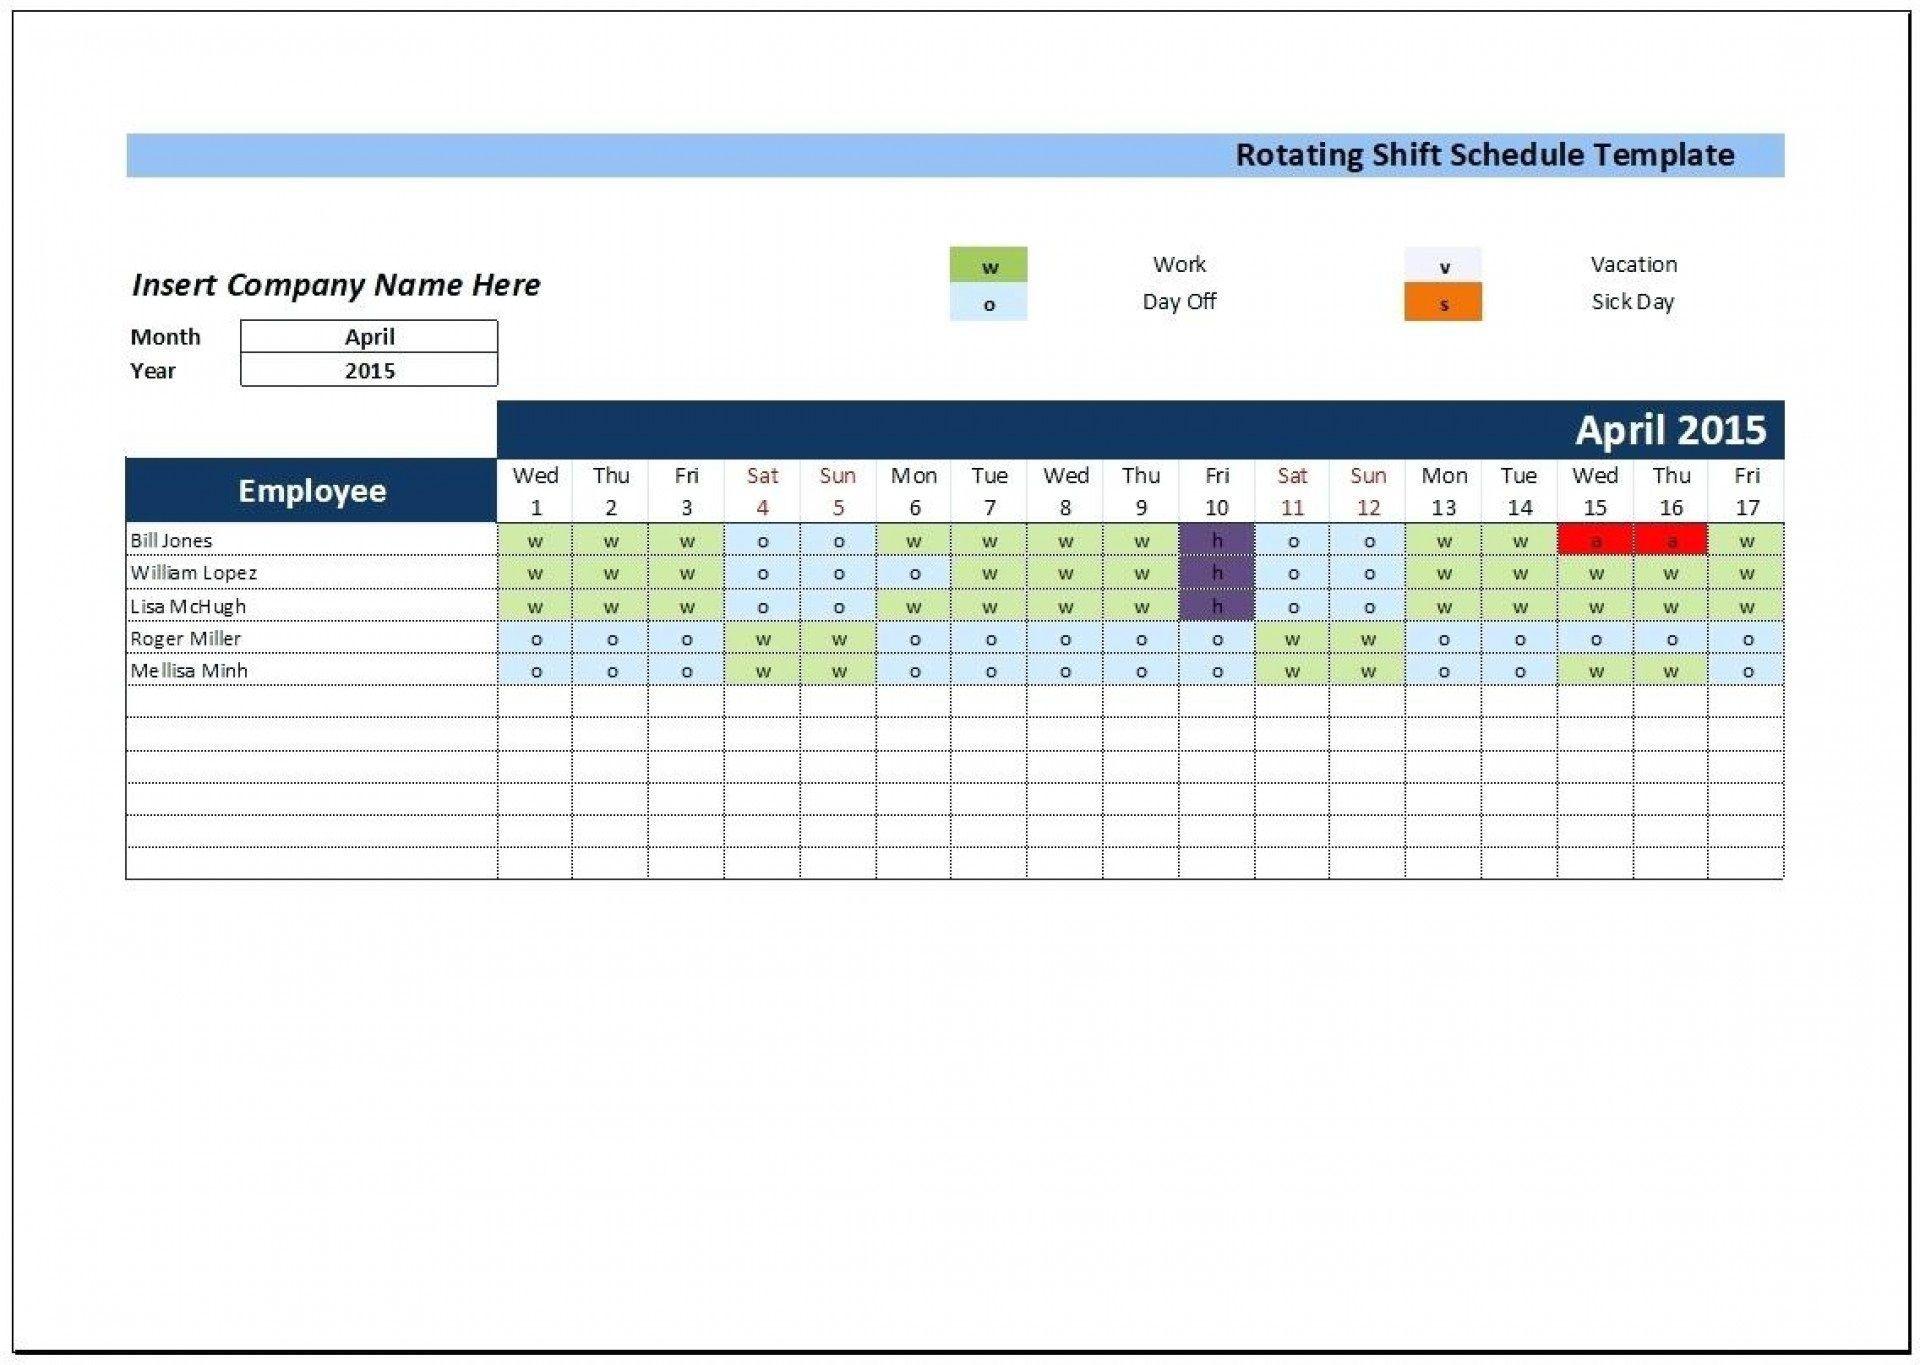 006 Impressive Excel 24 Hour Shift Schedule Template High Def 1920